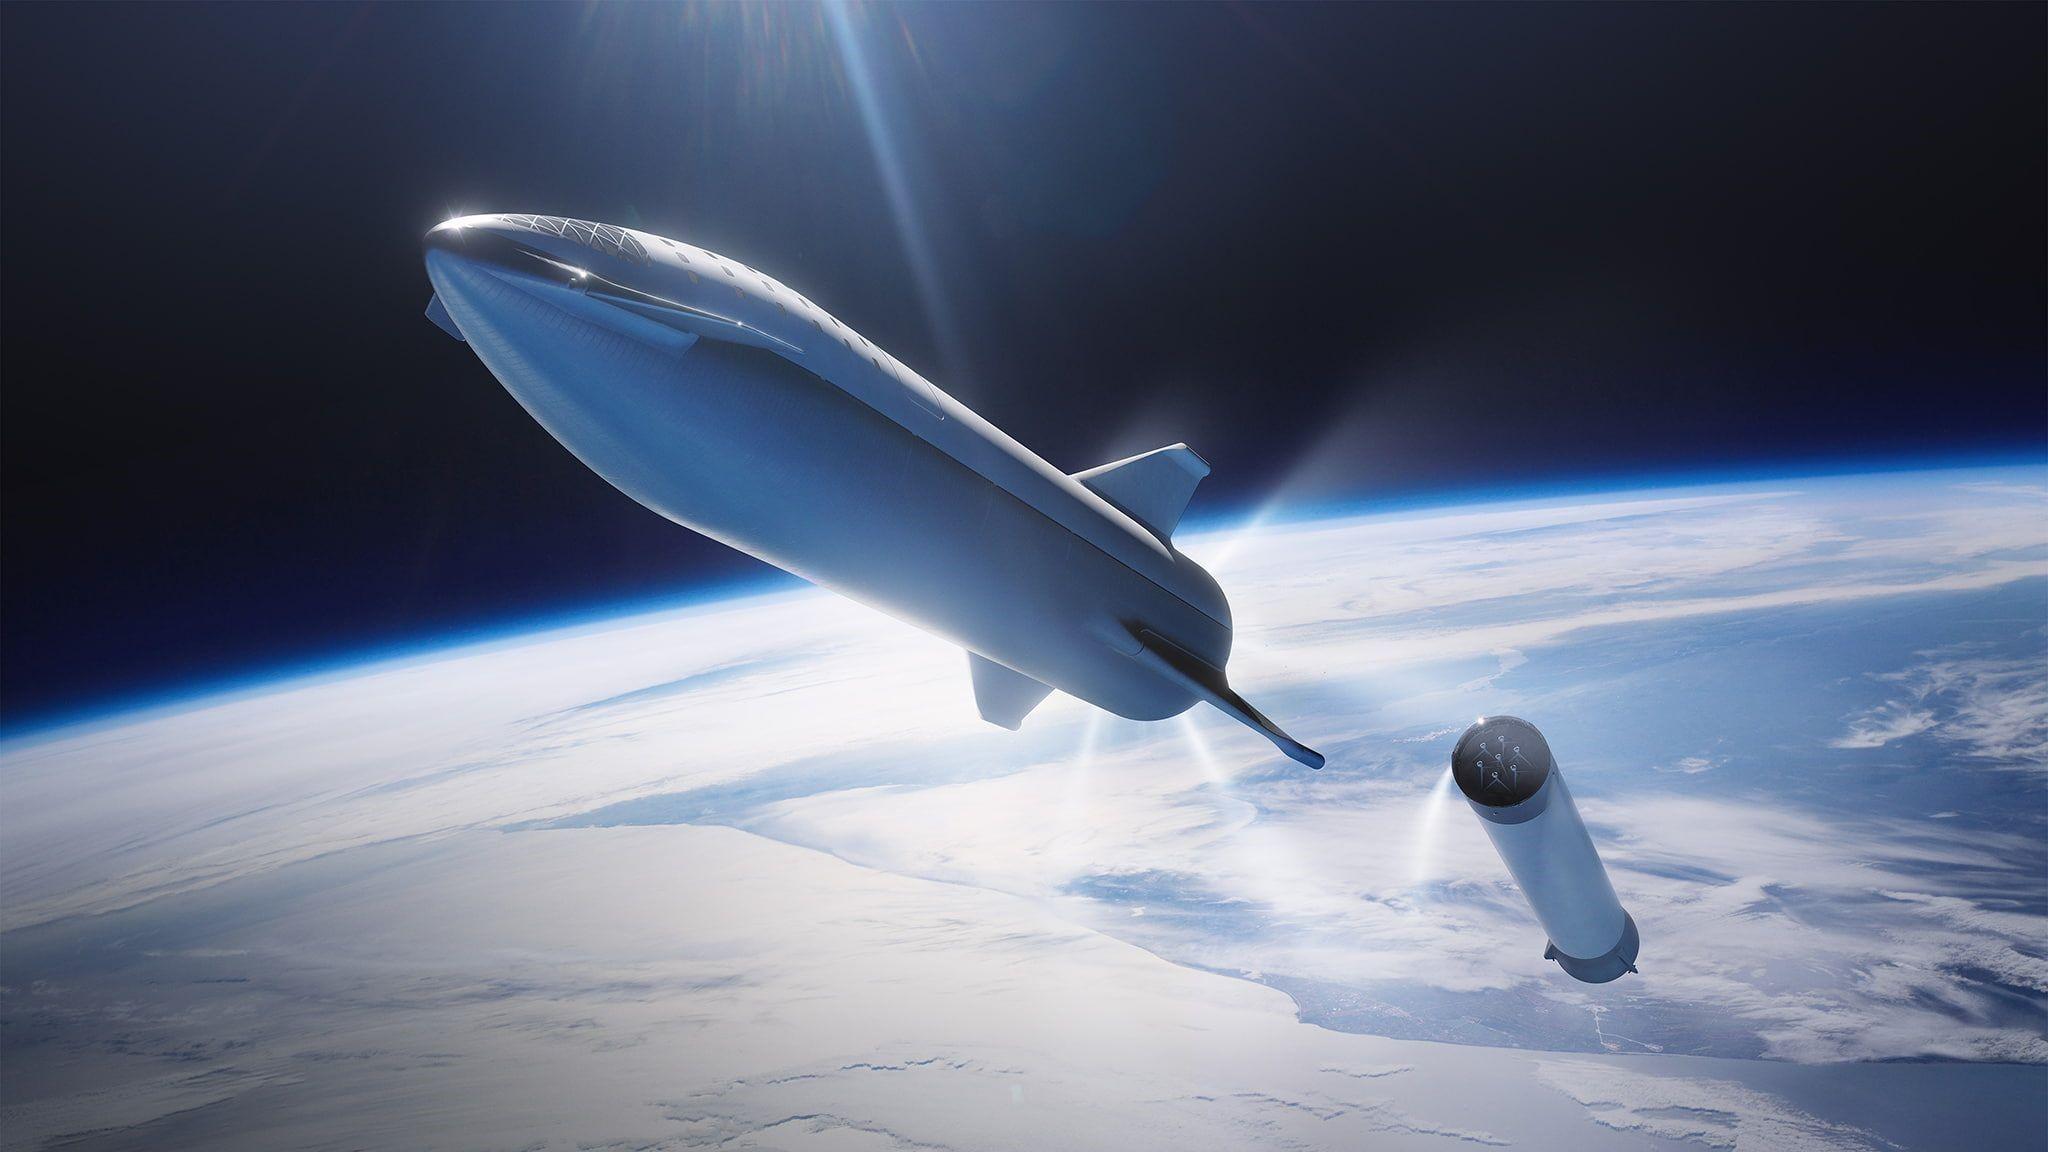 Space X Rocket Wallpaper